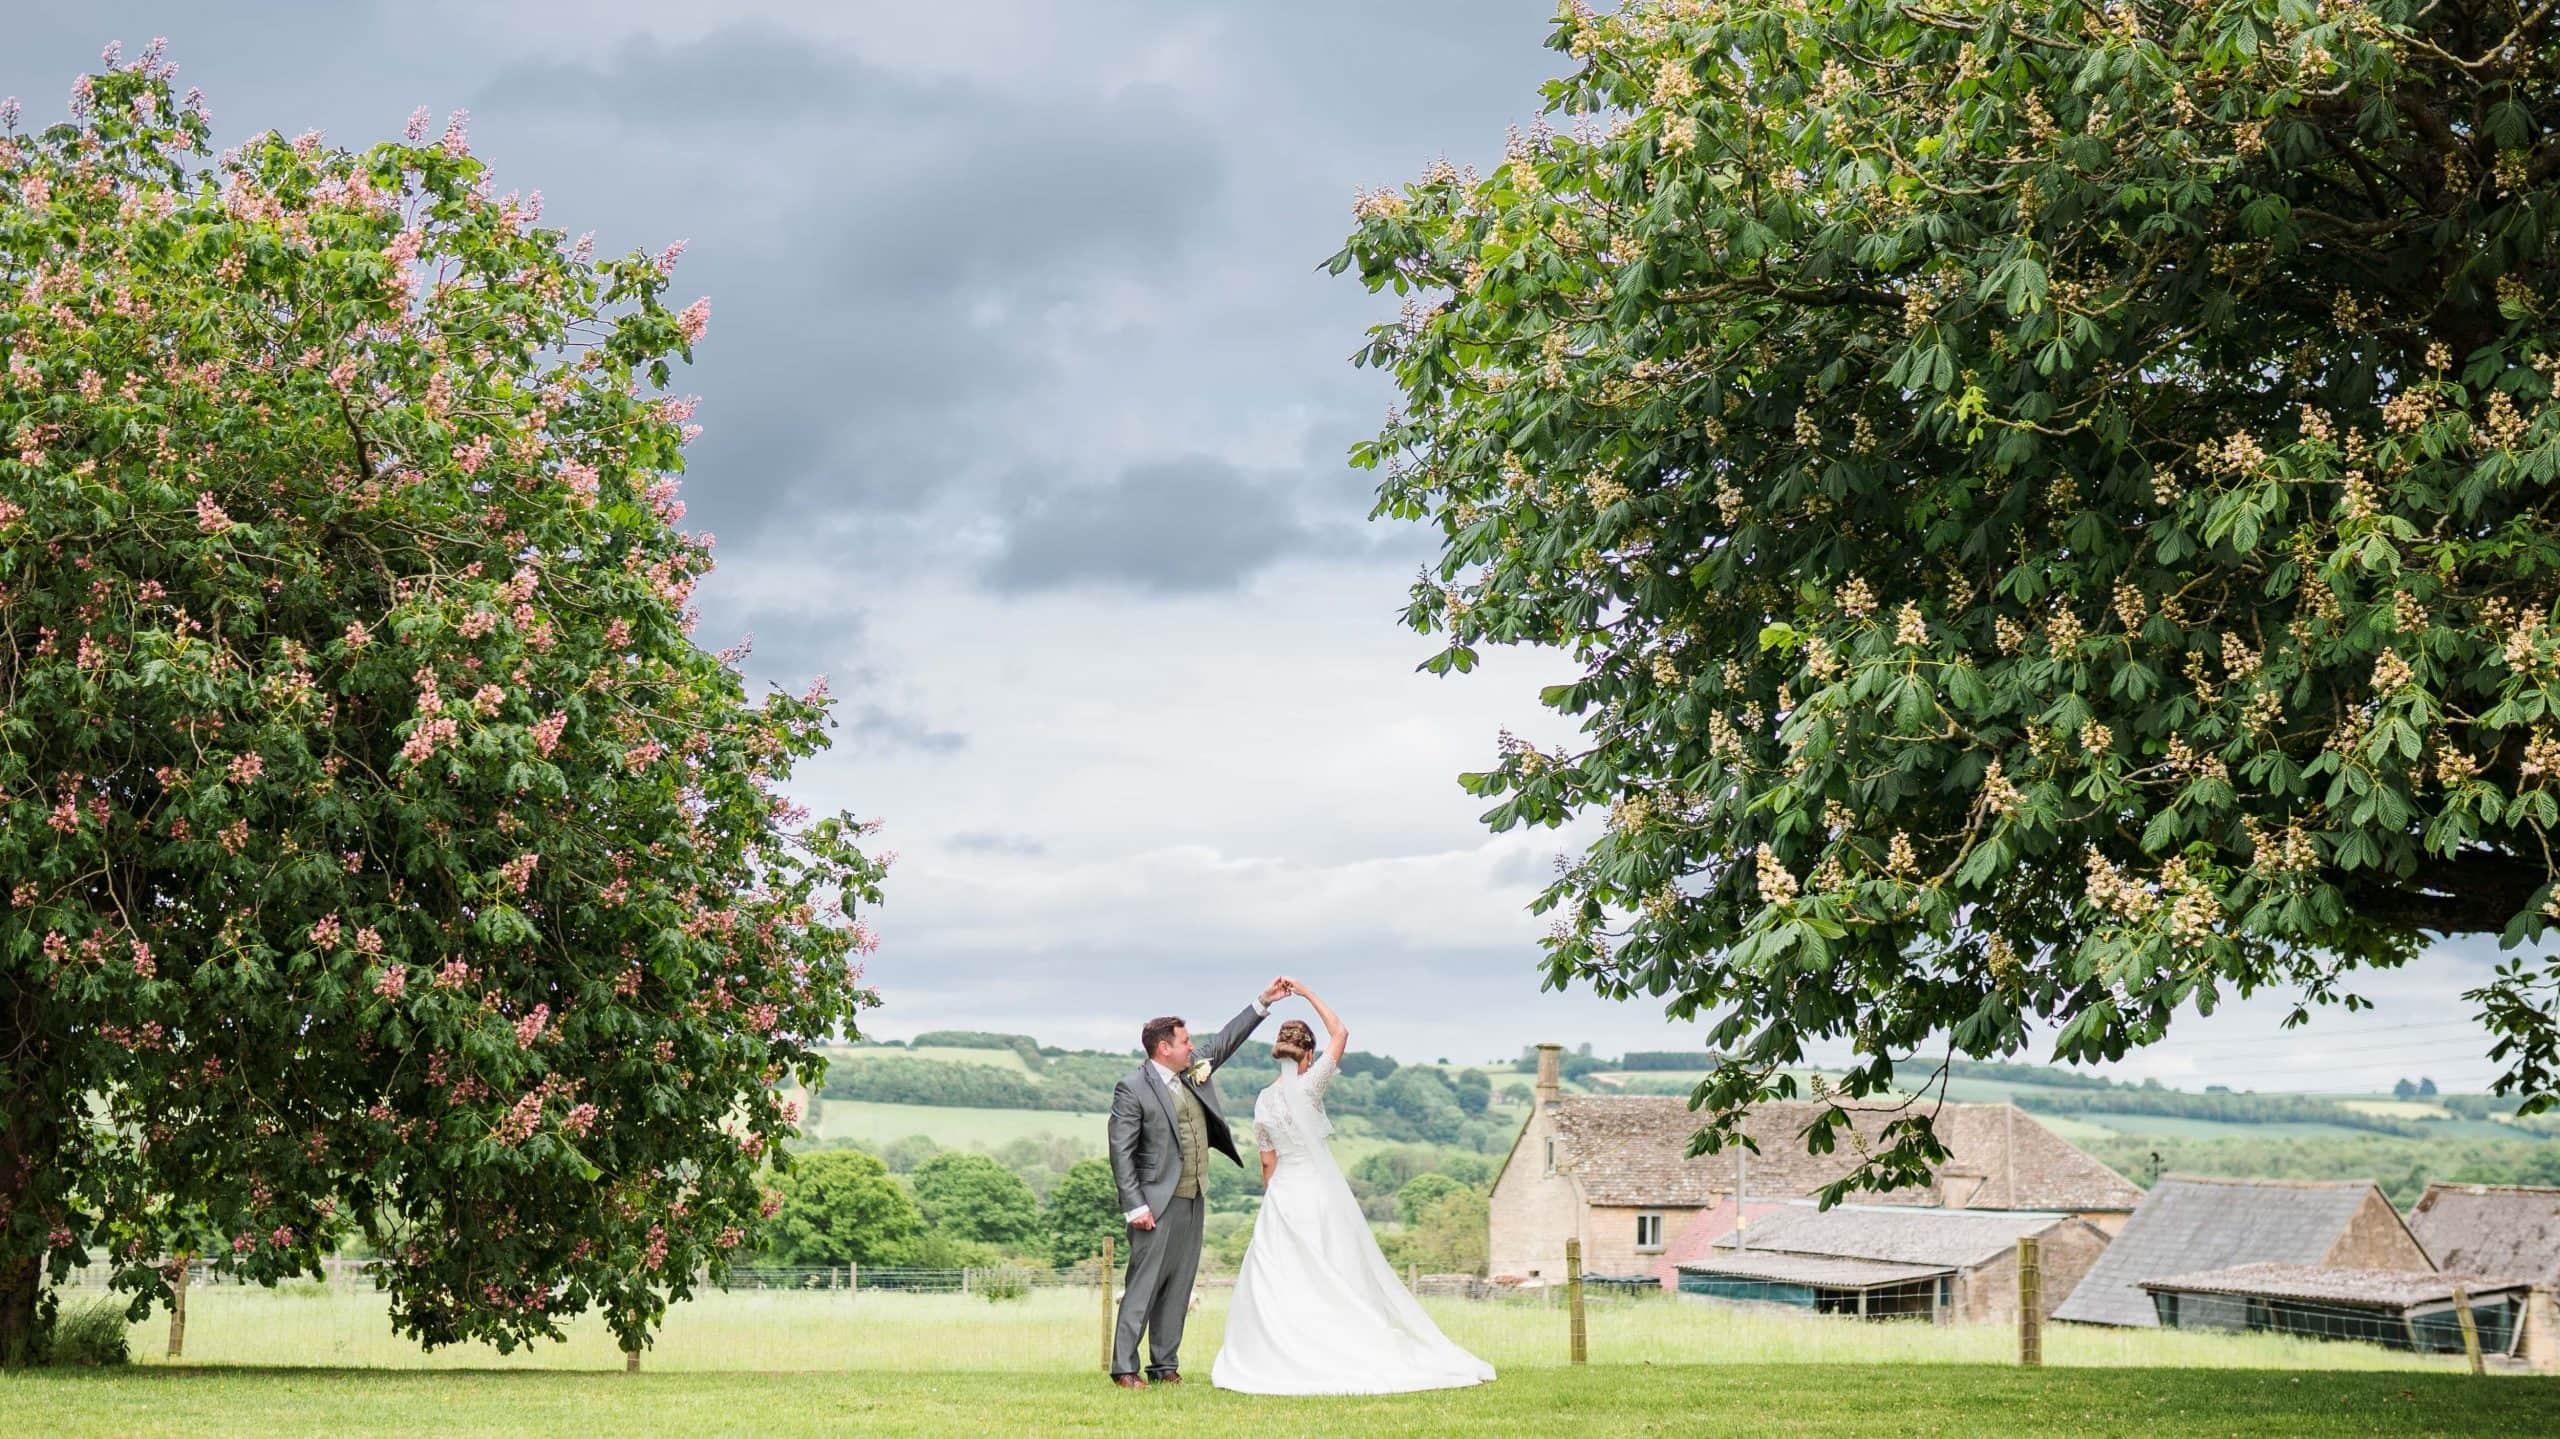 Lydia & Chris in the secret garden of The Barn at Upcote, Cheltenham wedding venue